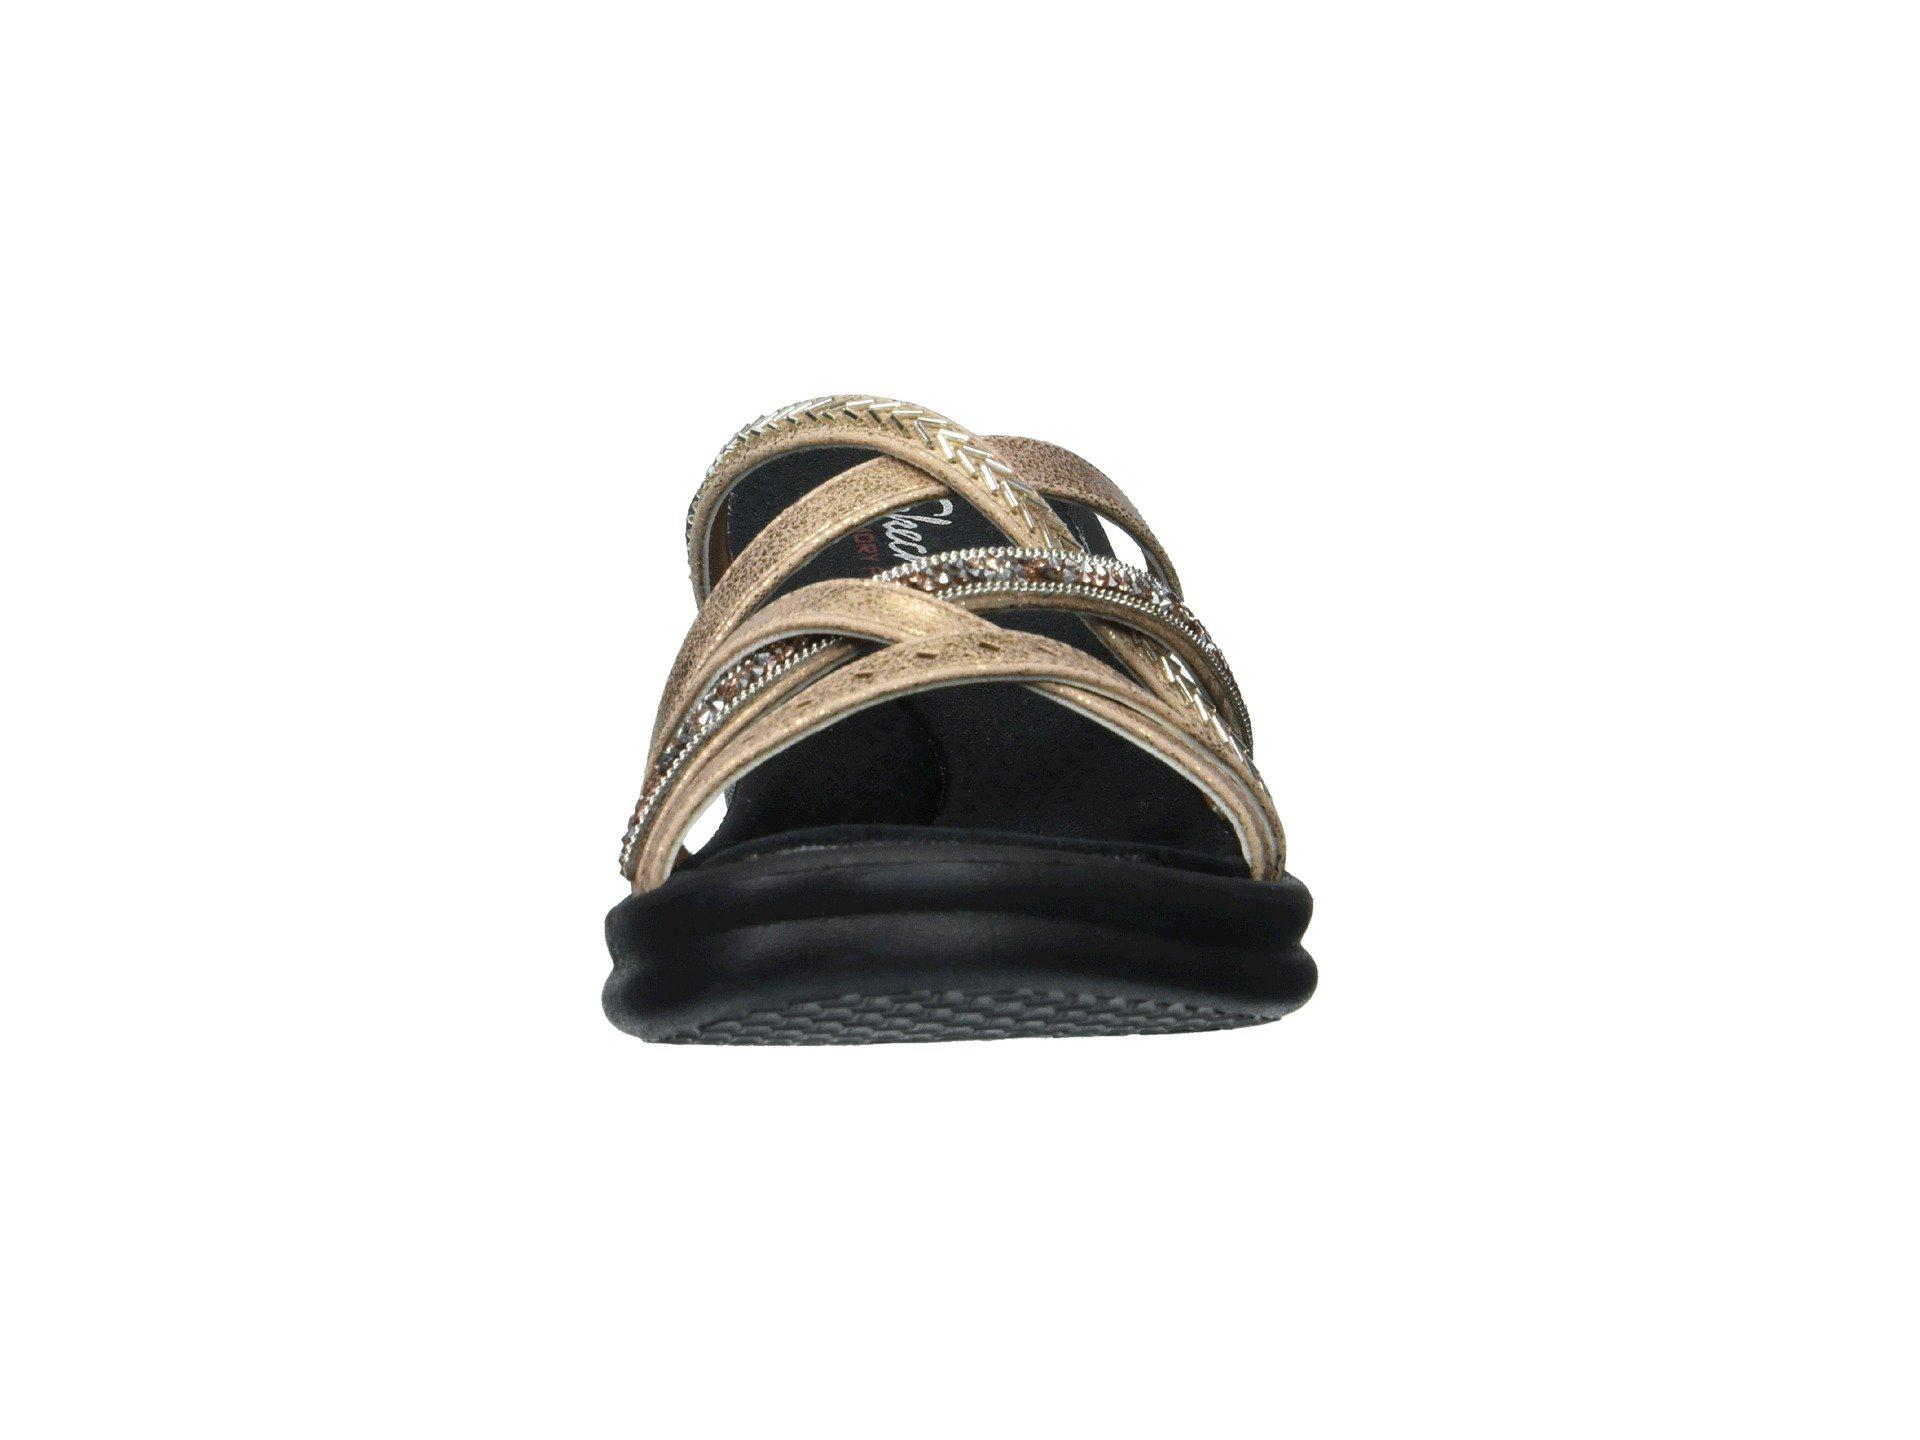 960ea01ff0b9 Skechers - Multicolor Rumbler Wave - New Lassie (rose Gold) Women s Shoes -  Lyst. View fullscreen